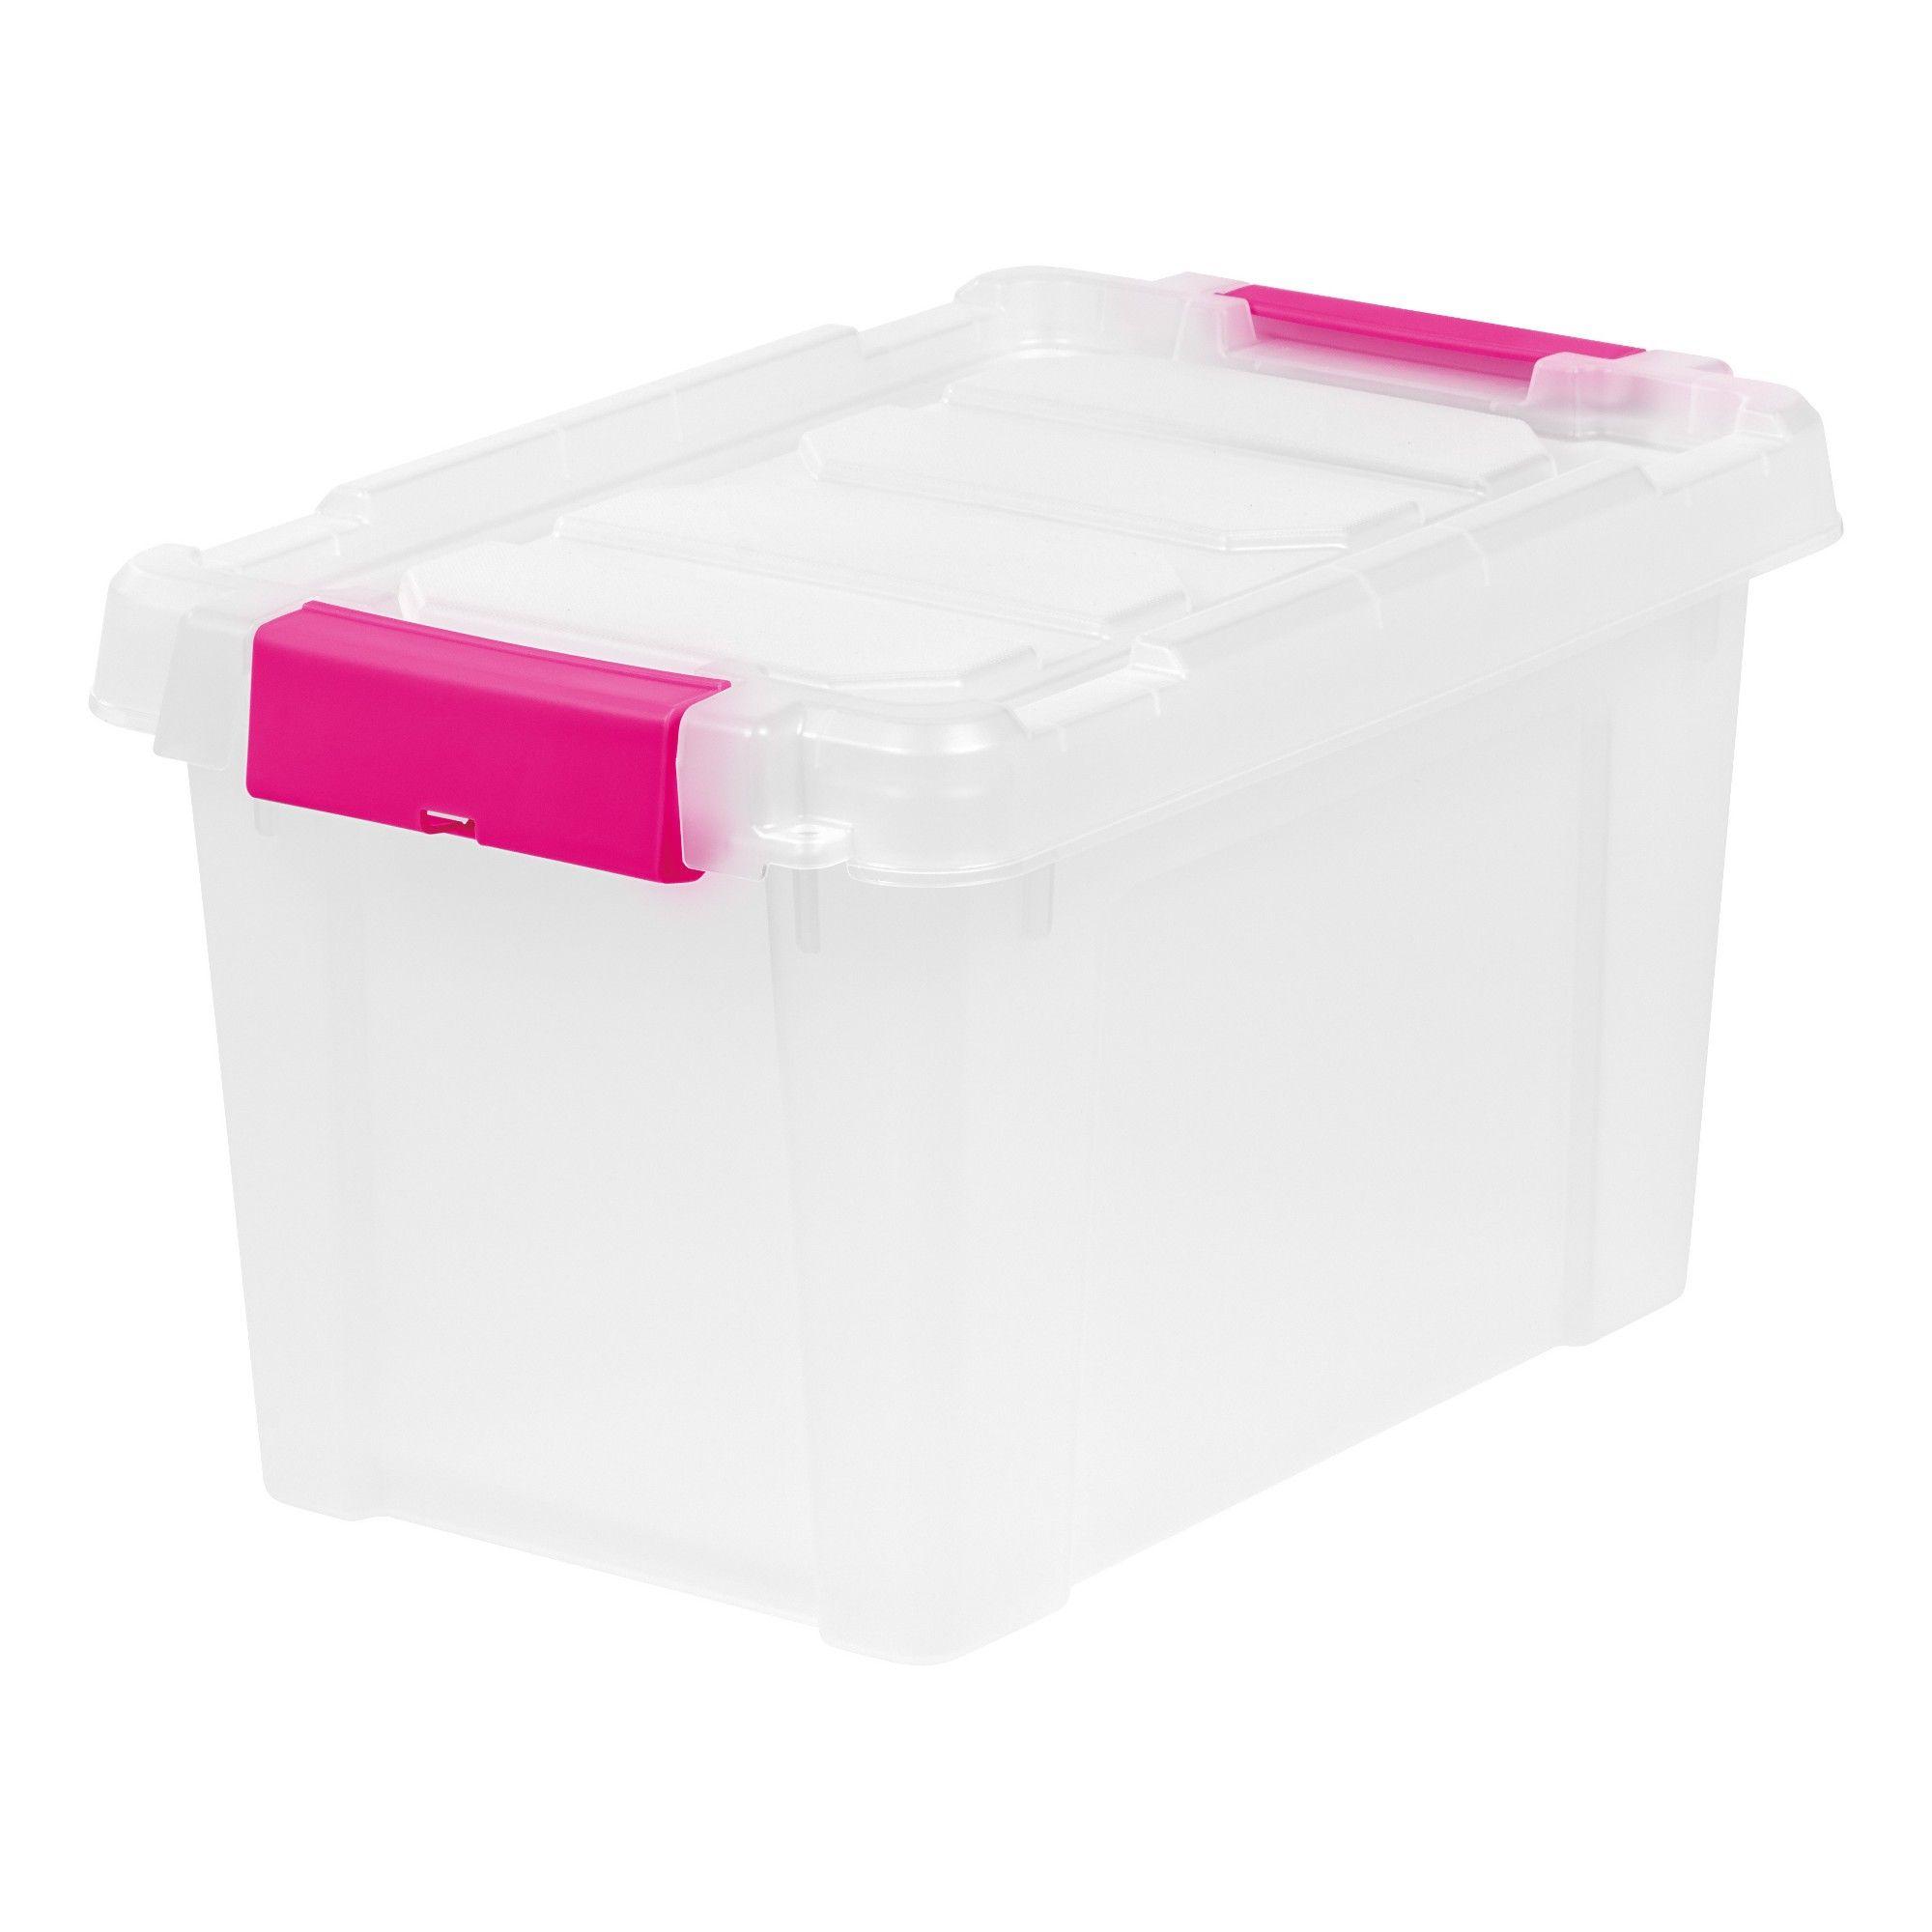 Iris 5 Gal Heavy Duty Plastic Storage Bin 6pk Pink Plastic